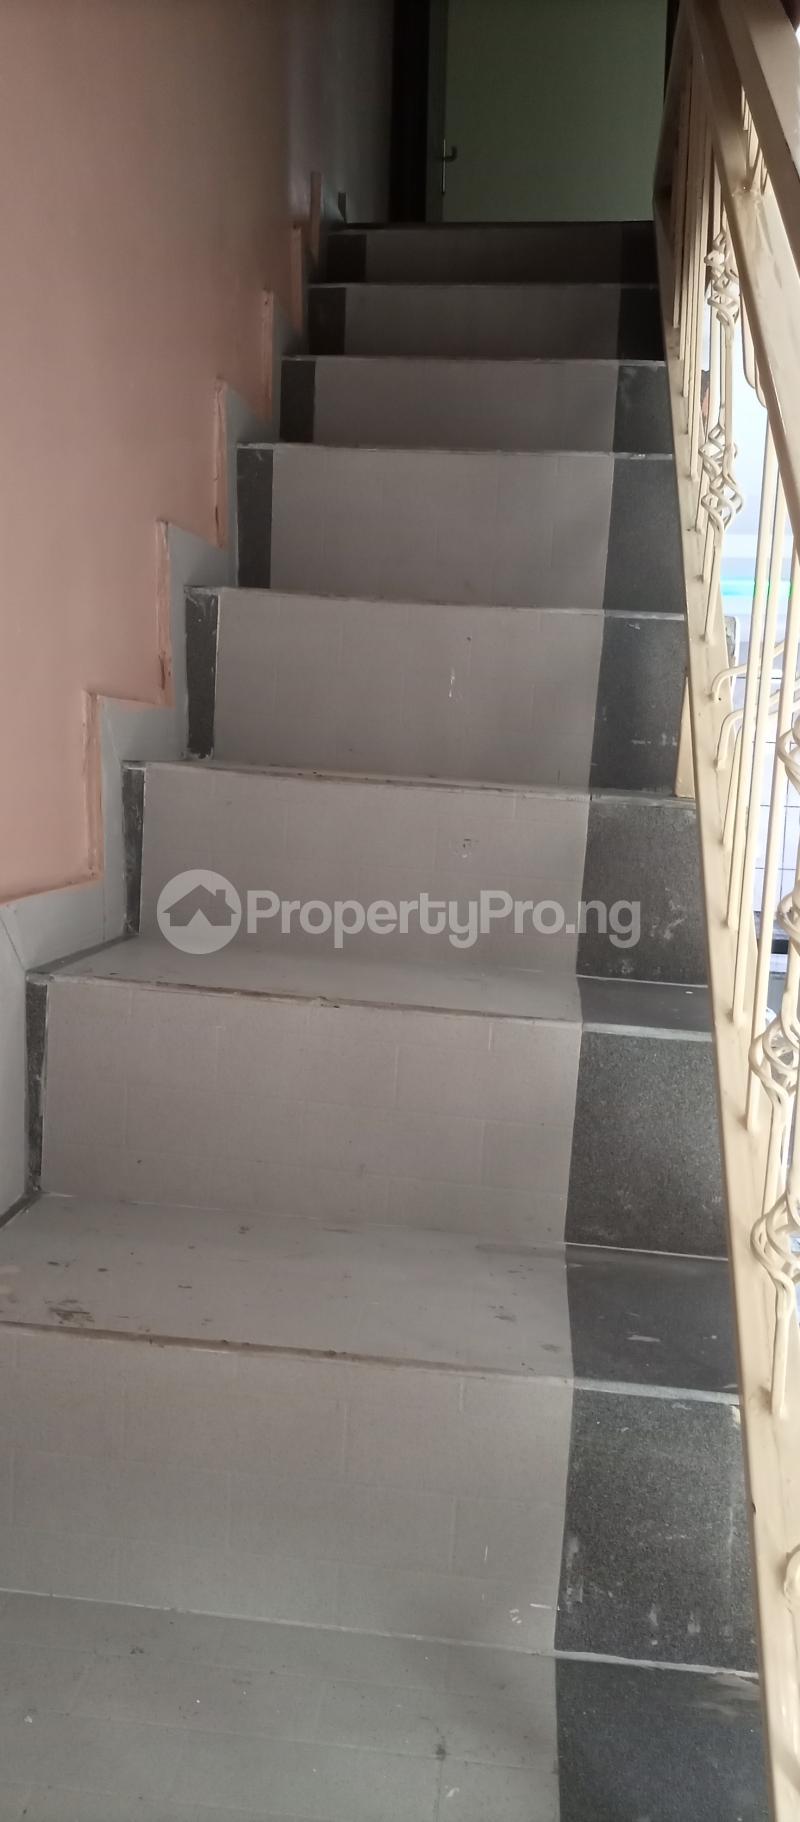 2 bedroom Flat / Apartment for rent Beside Victorotti School, Olokuta, Idi Aba Idi Aba Abeokuta Ogun - 3